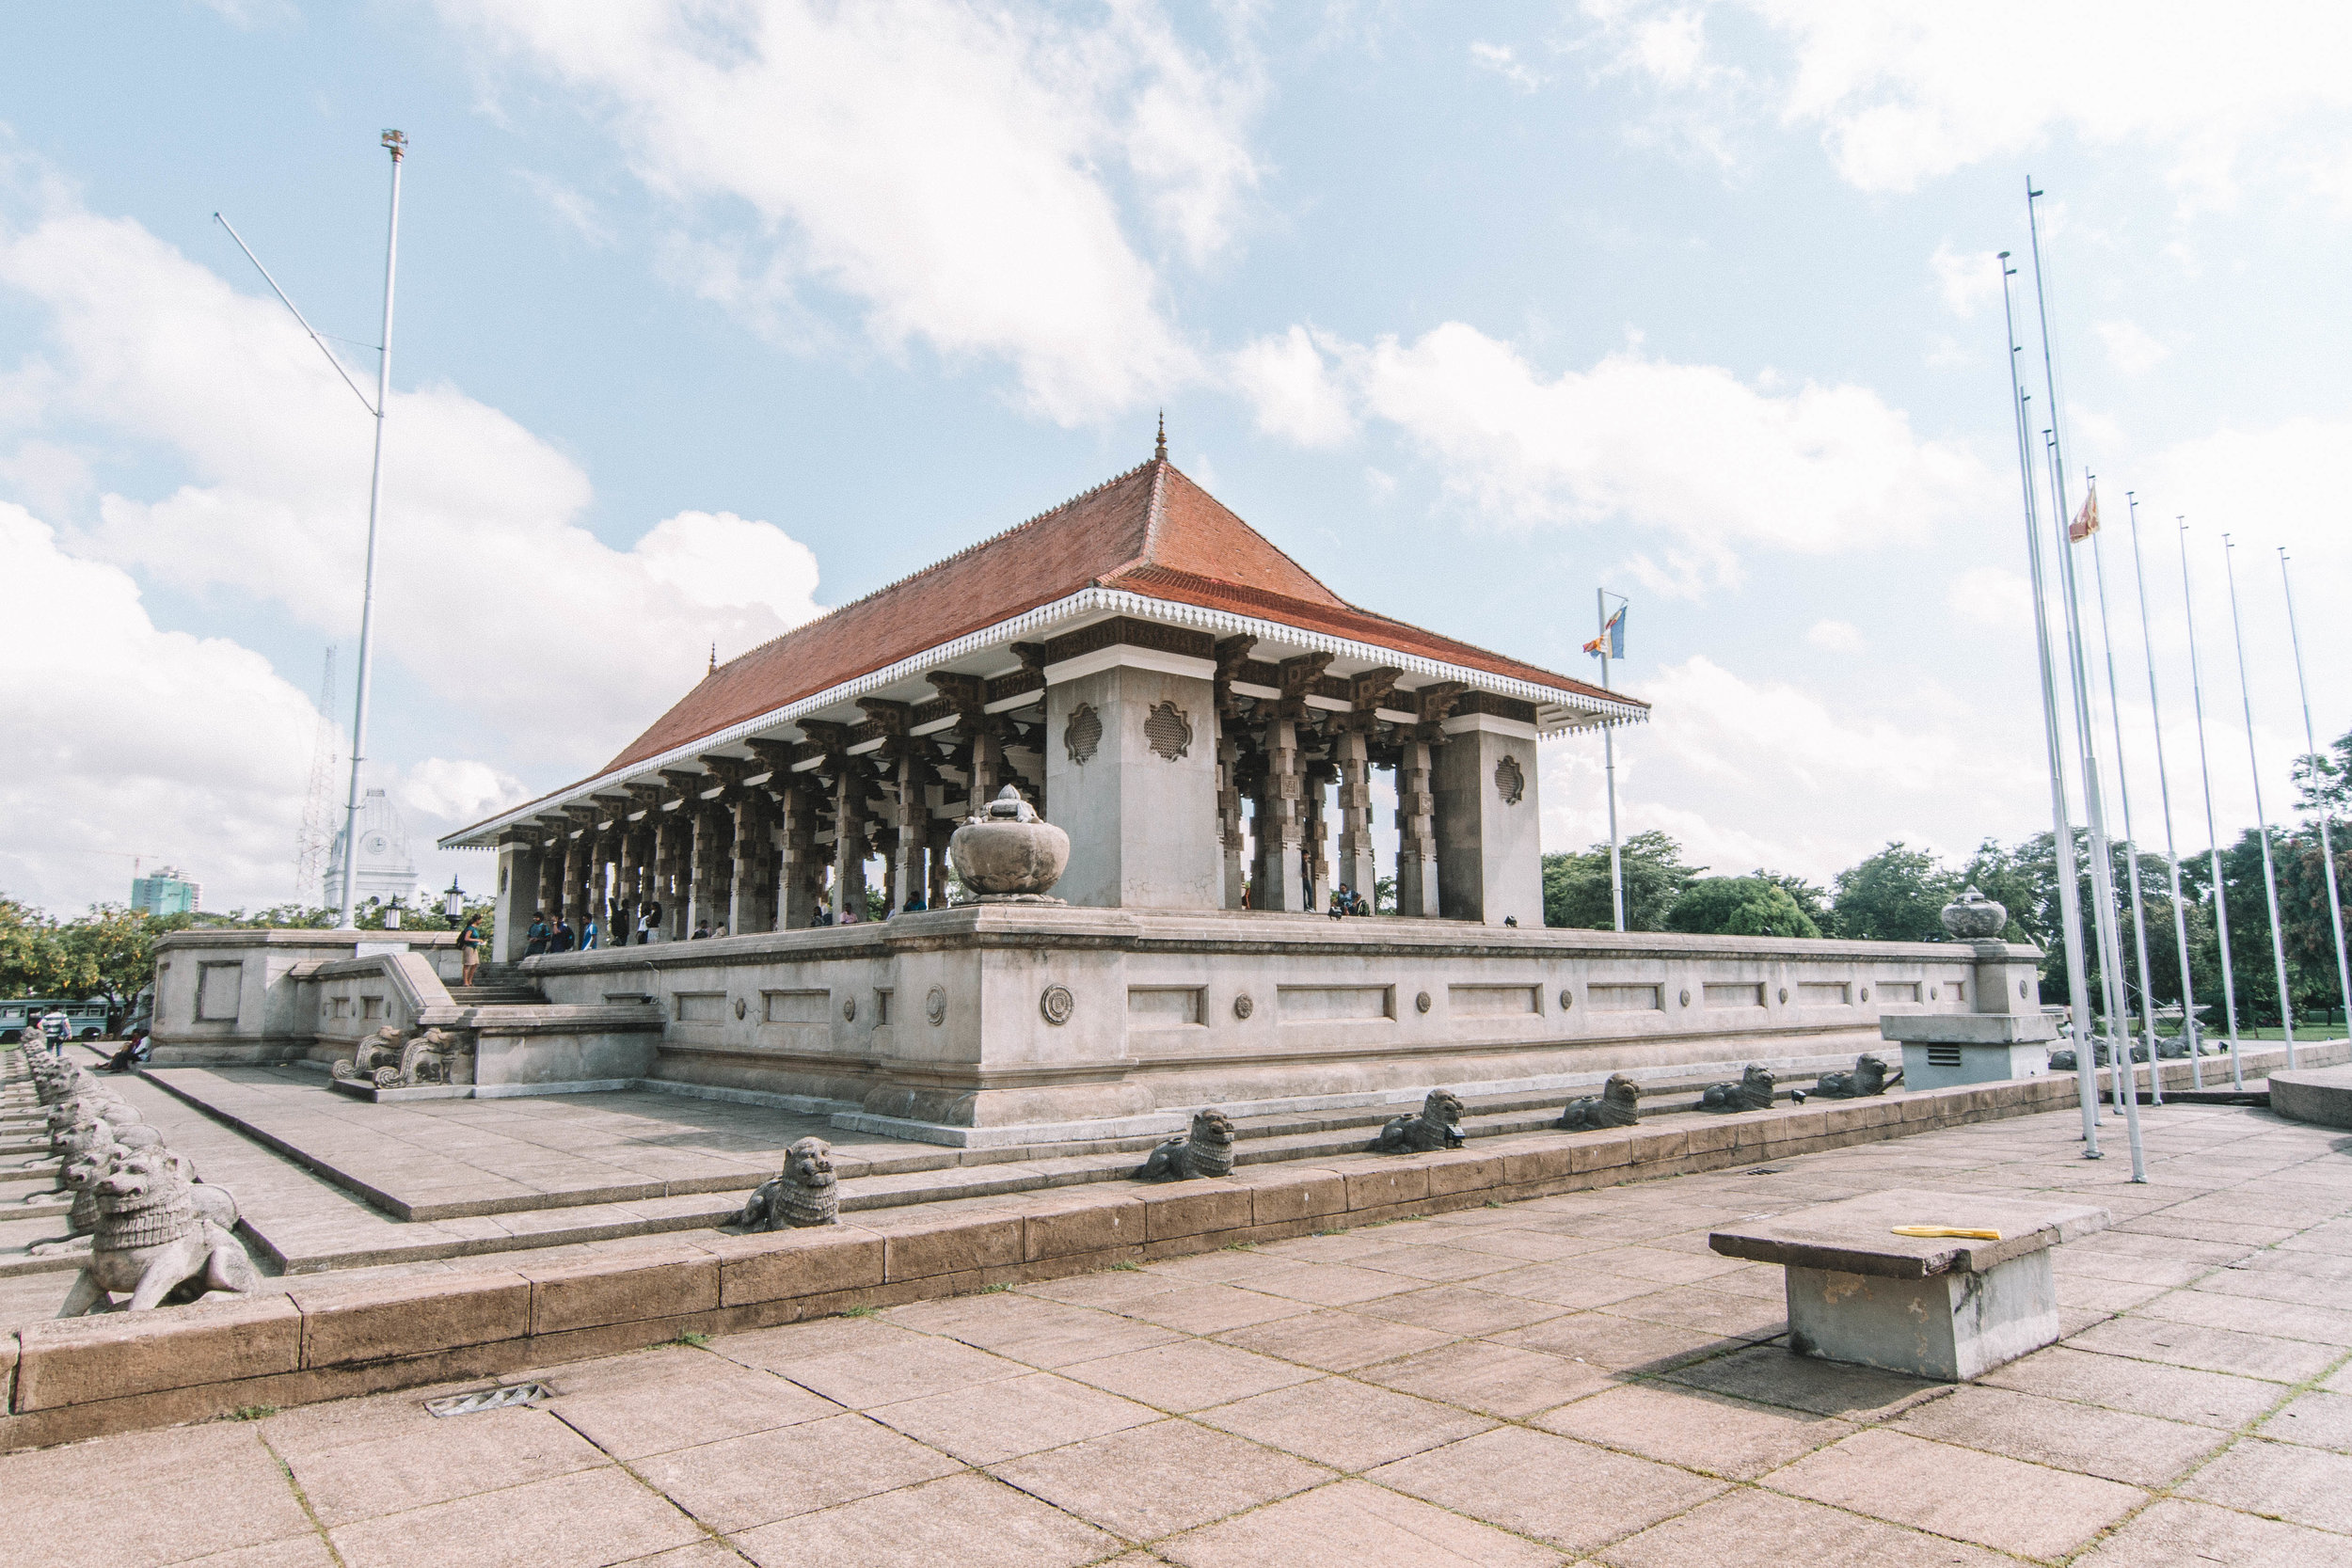 Sri_Lanka_Day1-62.jpg